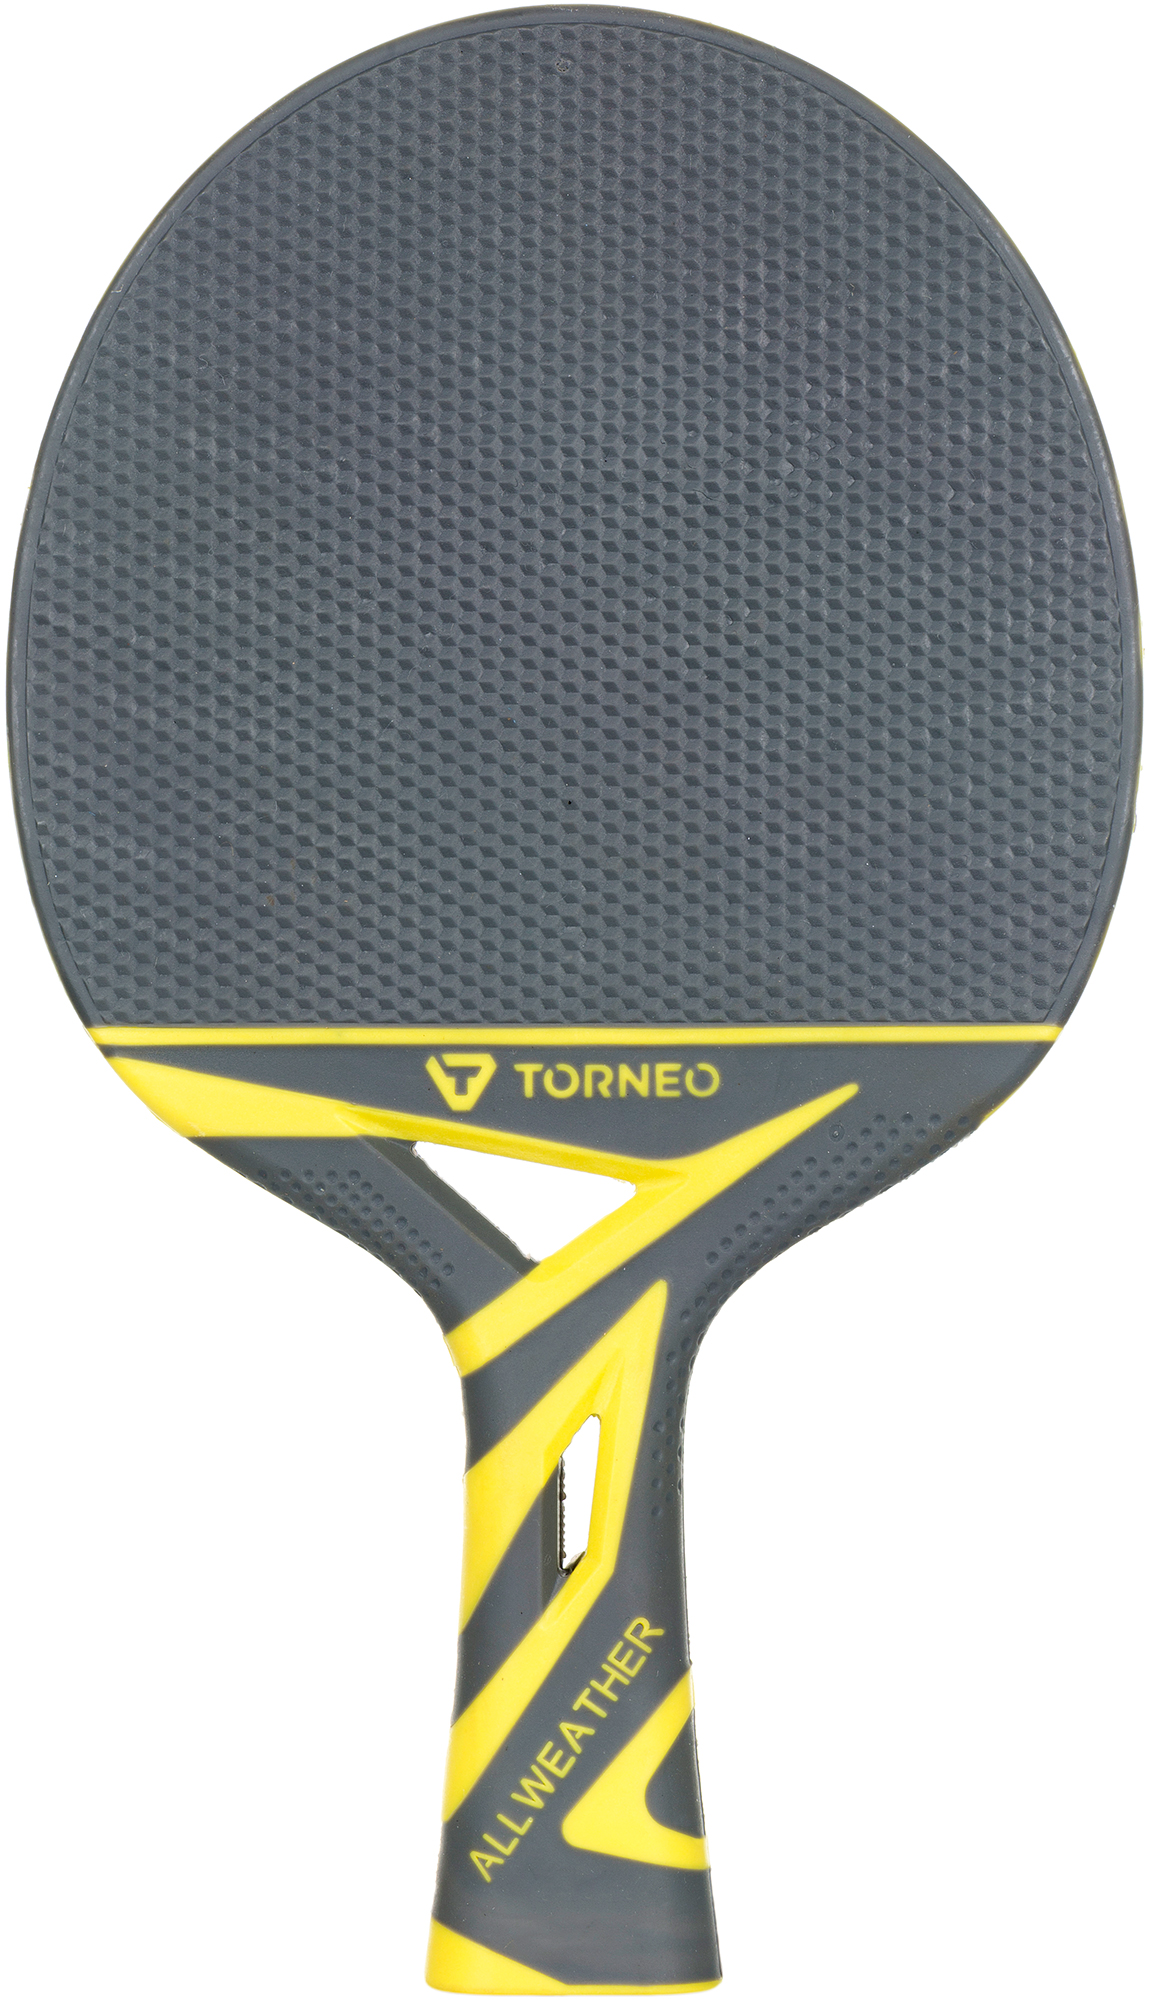 Torneo Ракетка для настольного тенниса Torneo Stormx ракетка для настольного тенниса stiga hobby heal